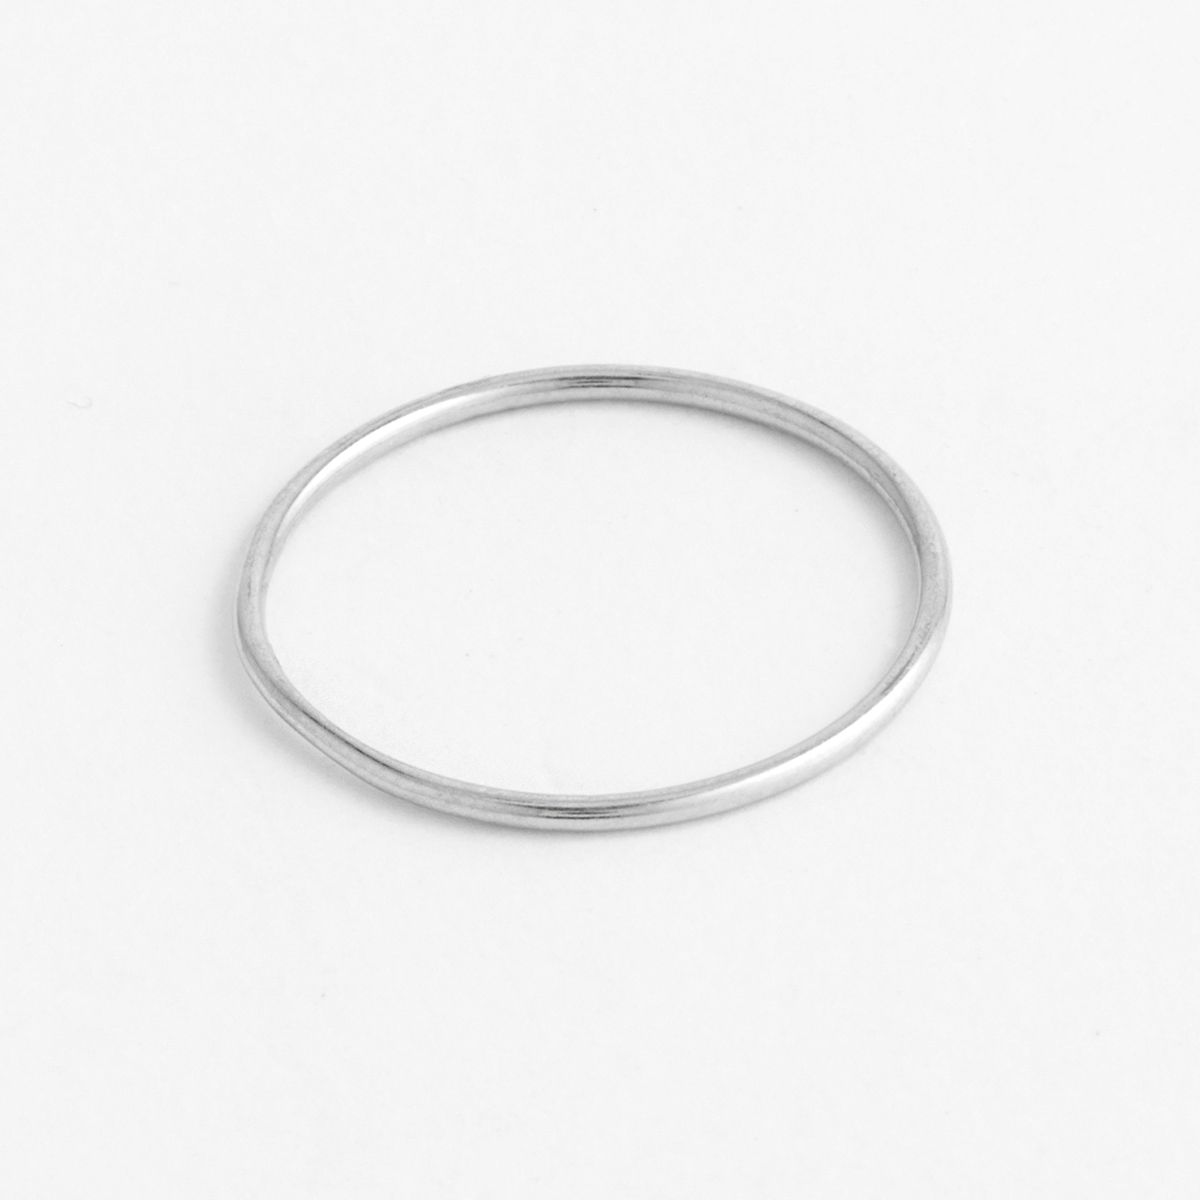 Selina - Ringe - Silber